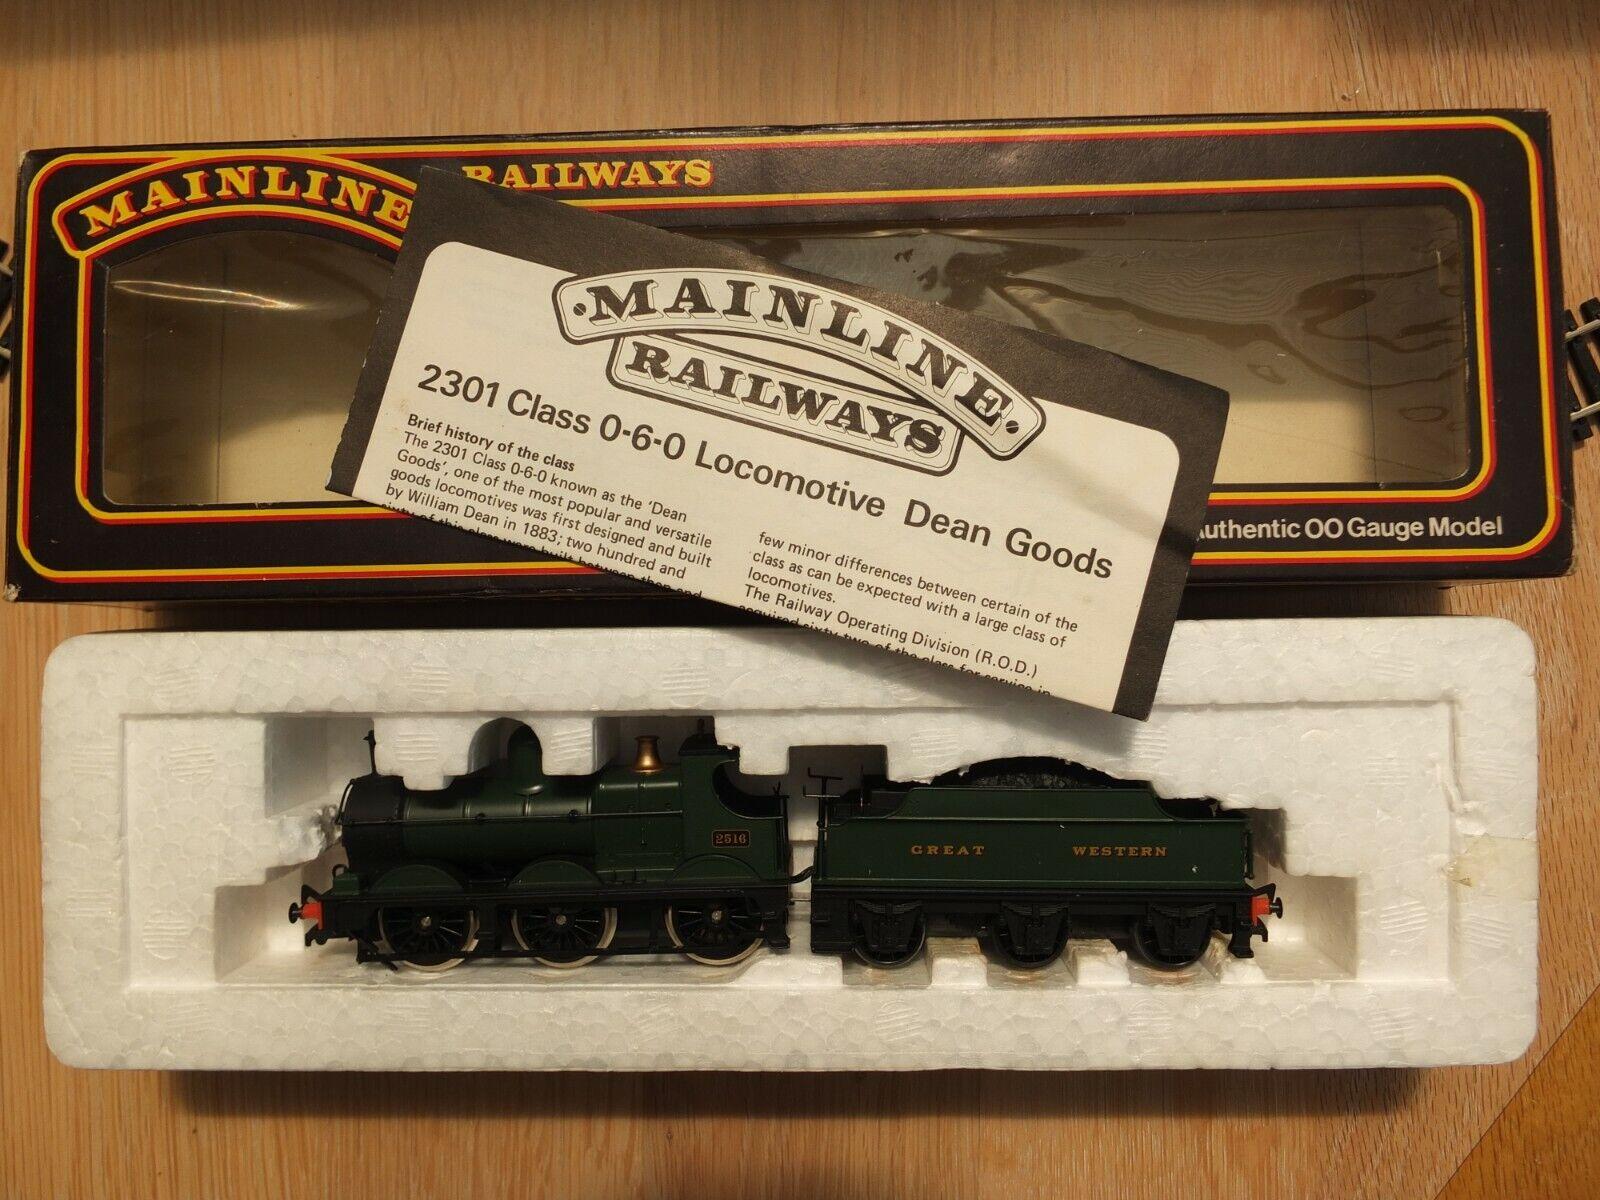 Mainline 54156 GWR Class 2301 Dean Goods 0-6-0 Locomotive 2516 & Tender - Boxed